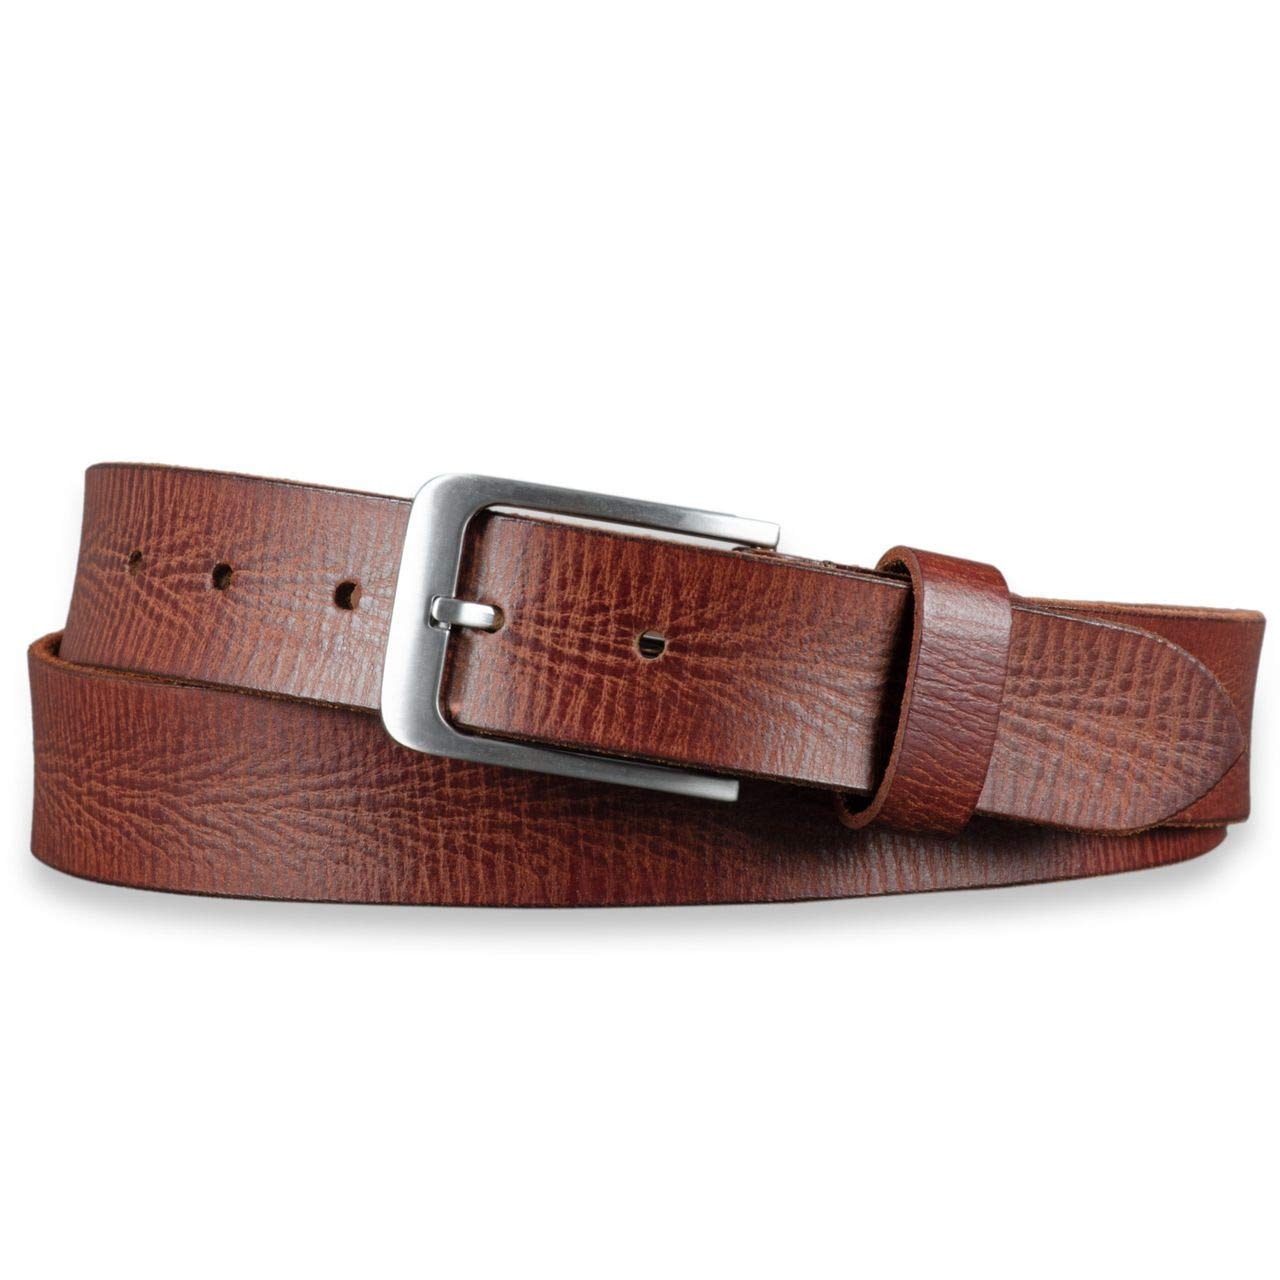 STILORD Cintur ó n de Cuero para Hombre de B ú falo Robusto Correa ... aef55cbb4980